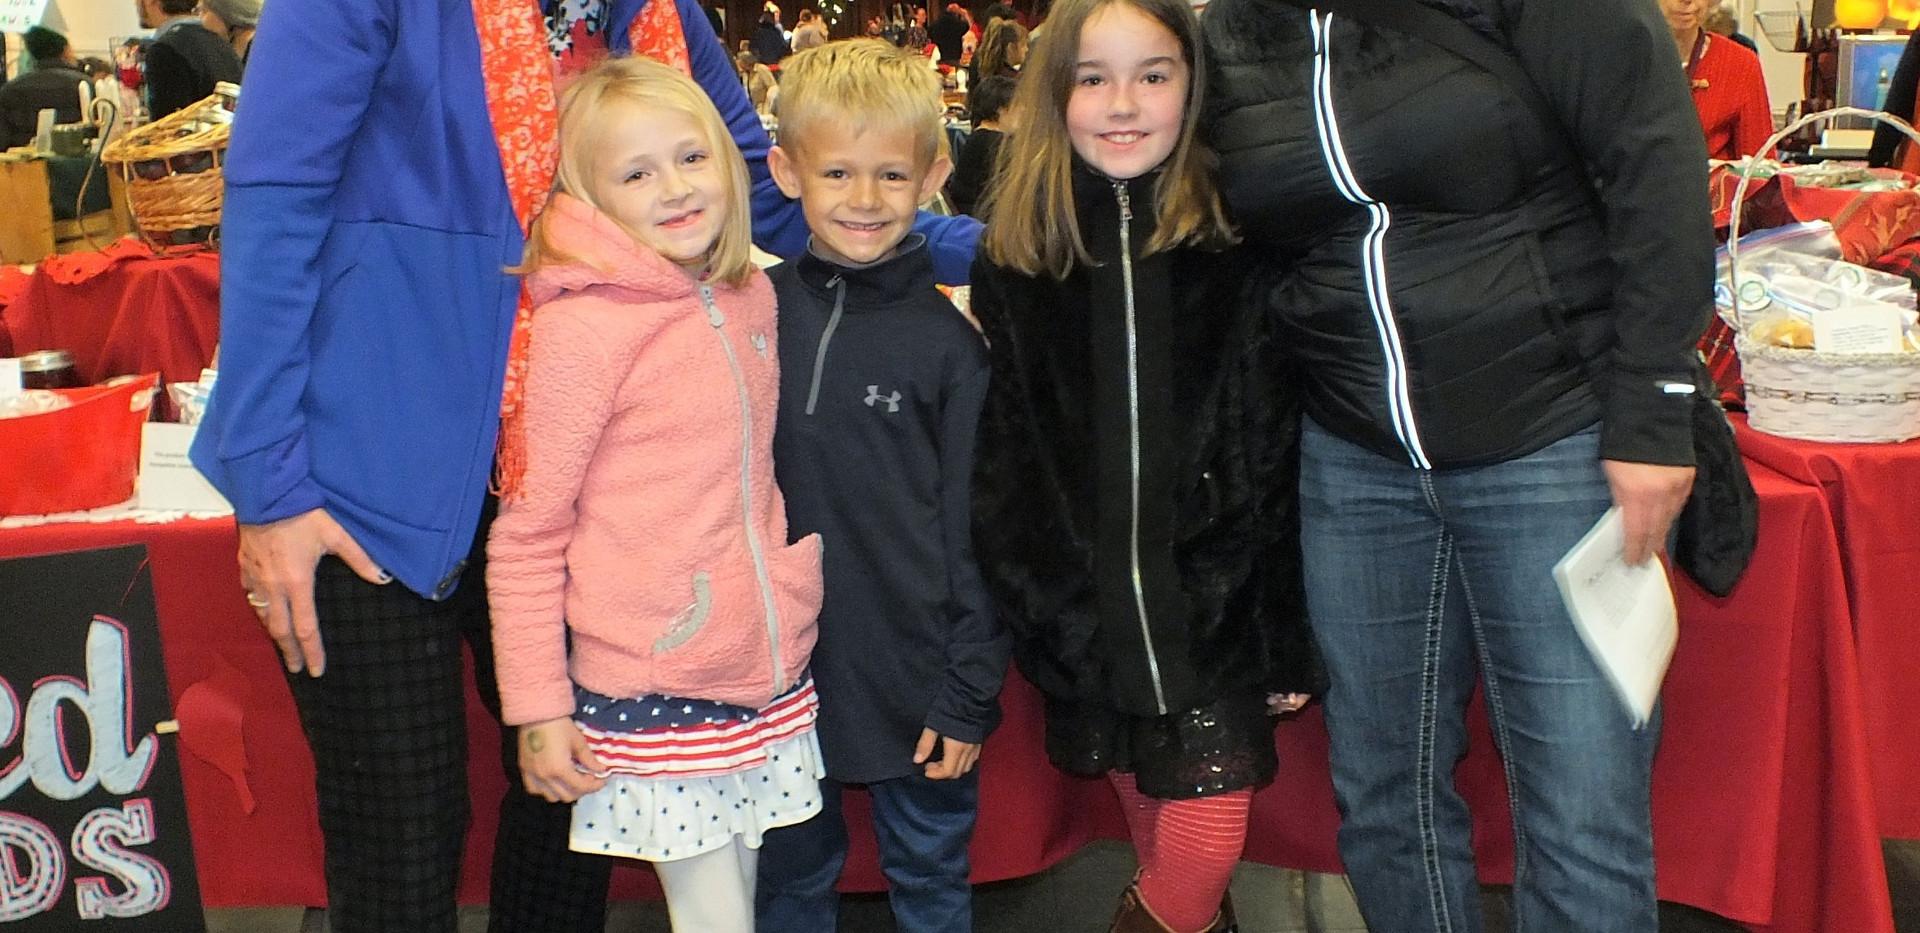 ChristmasattheBrook2019_Family_enjoying_